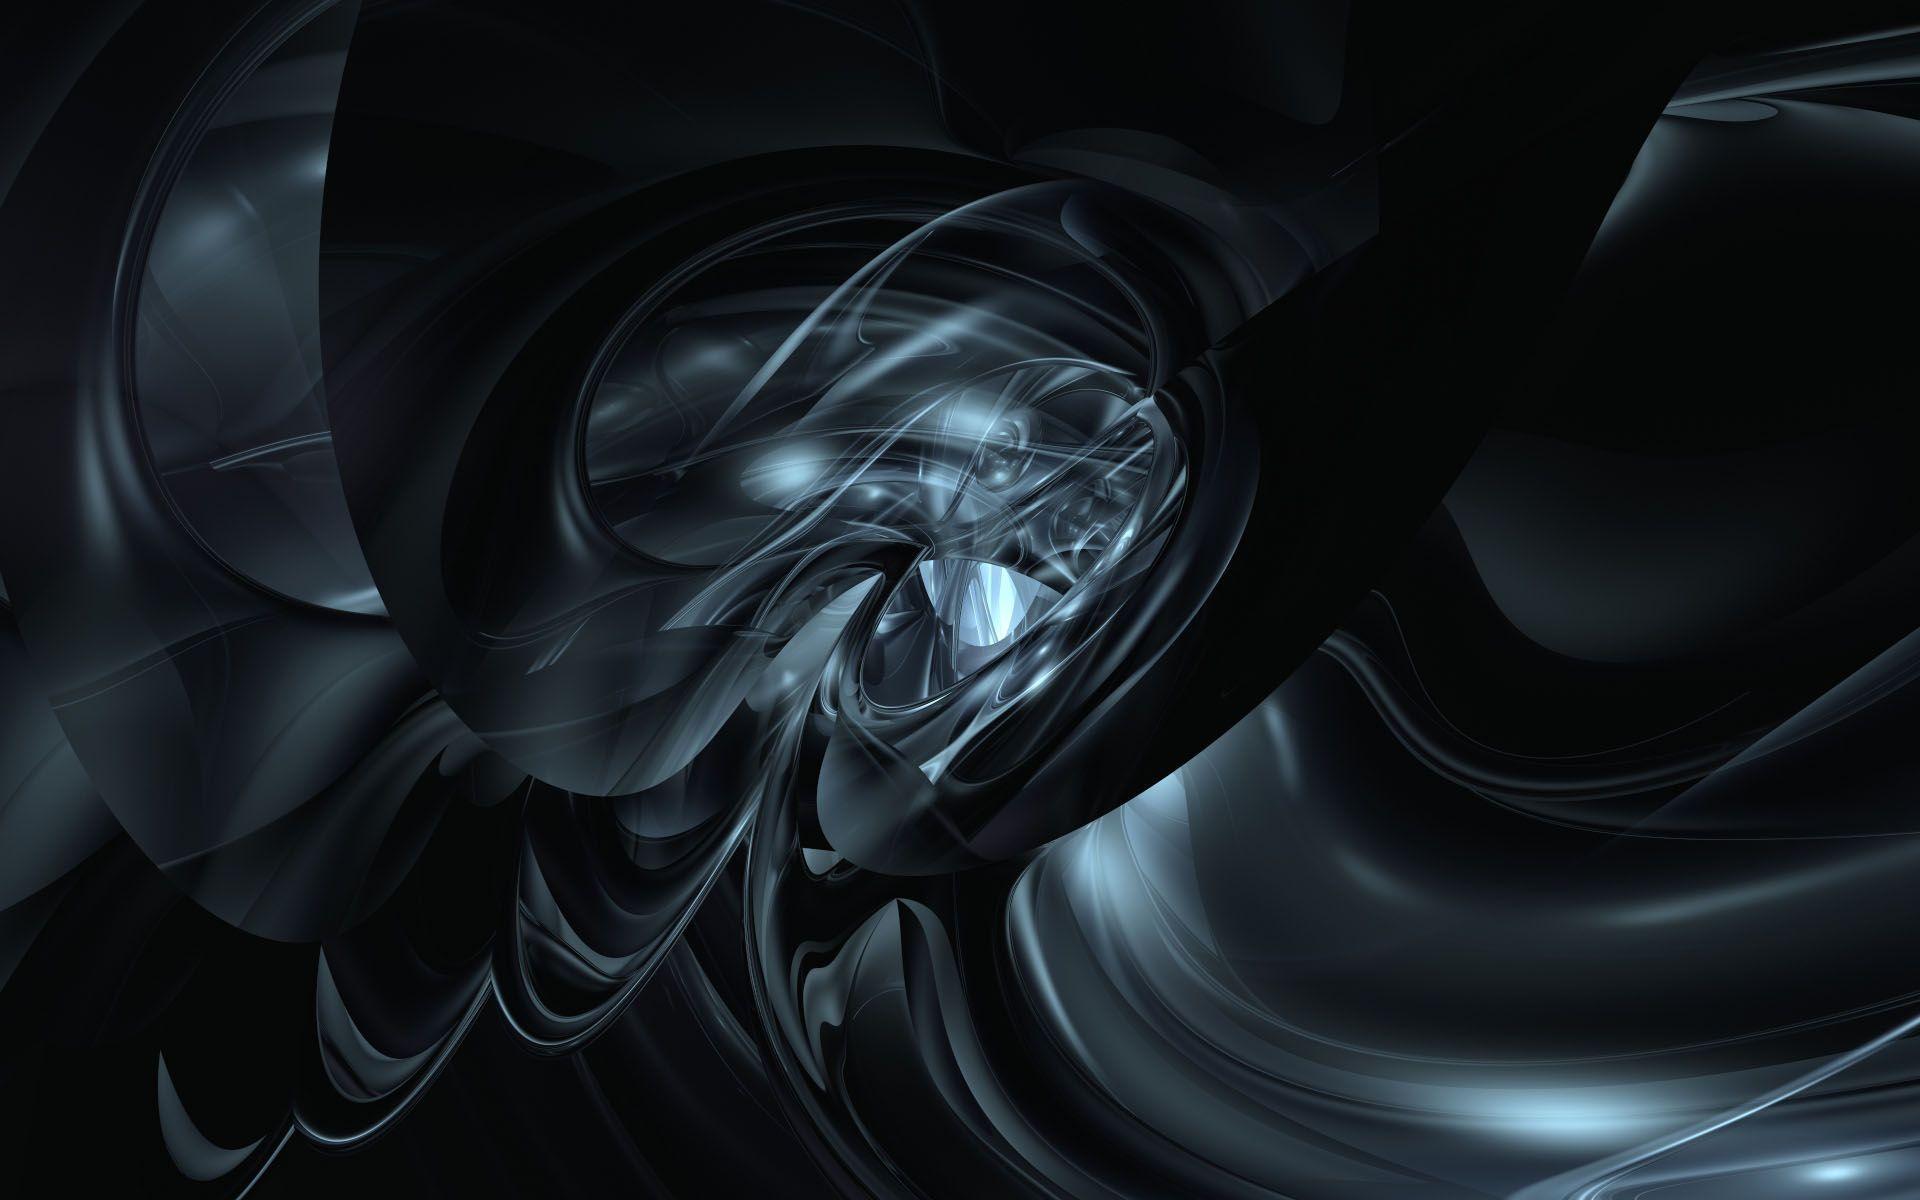 3d black backgrounds wi25 - photo #20